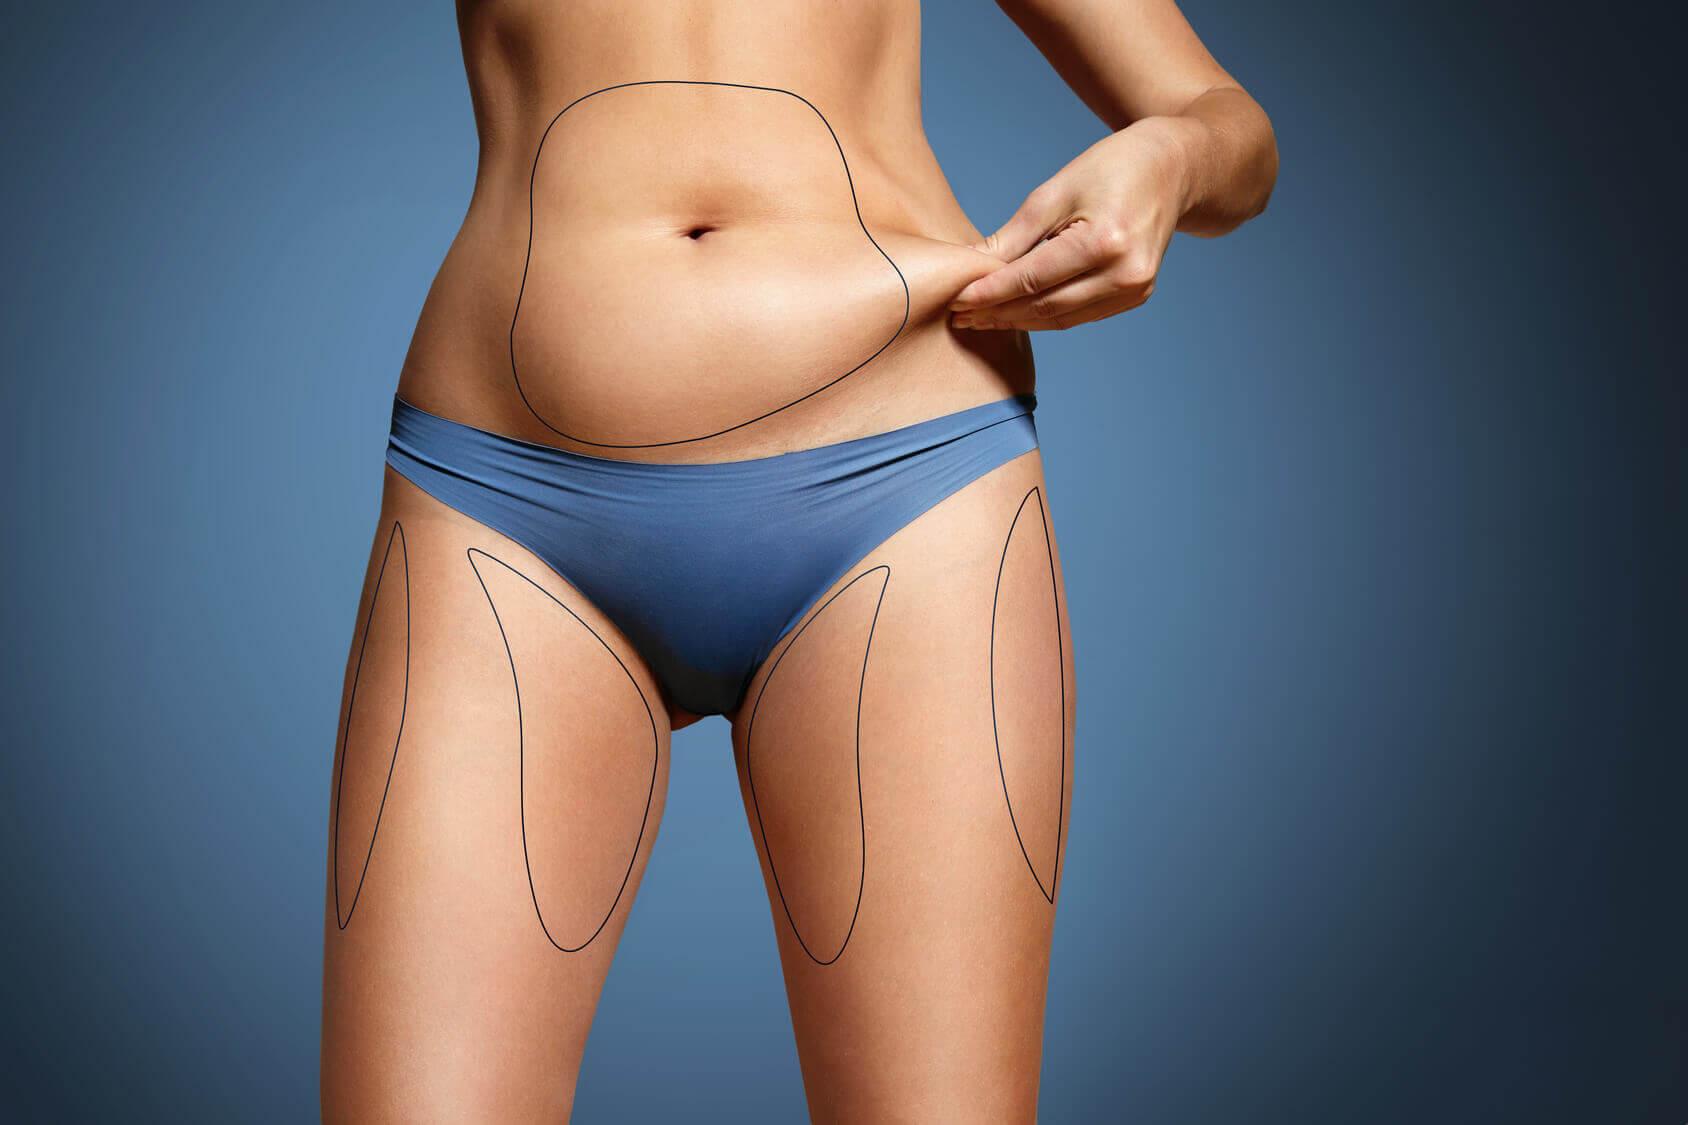 chirurgie-esthetique-liposuccion_5f574d659e581.jpg